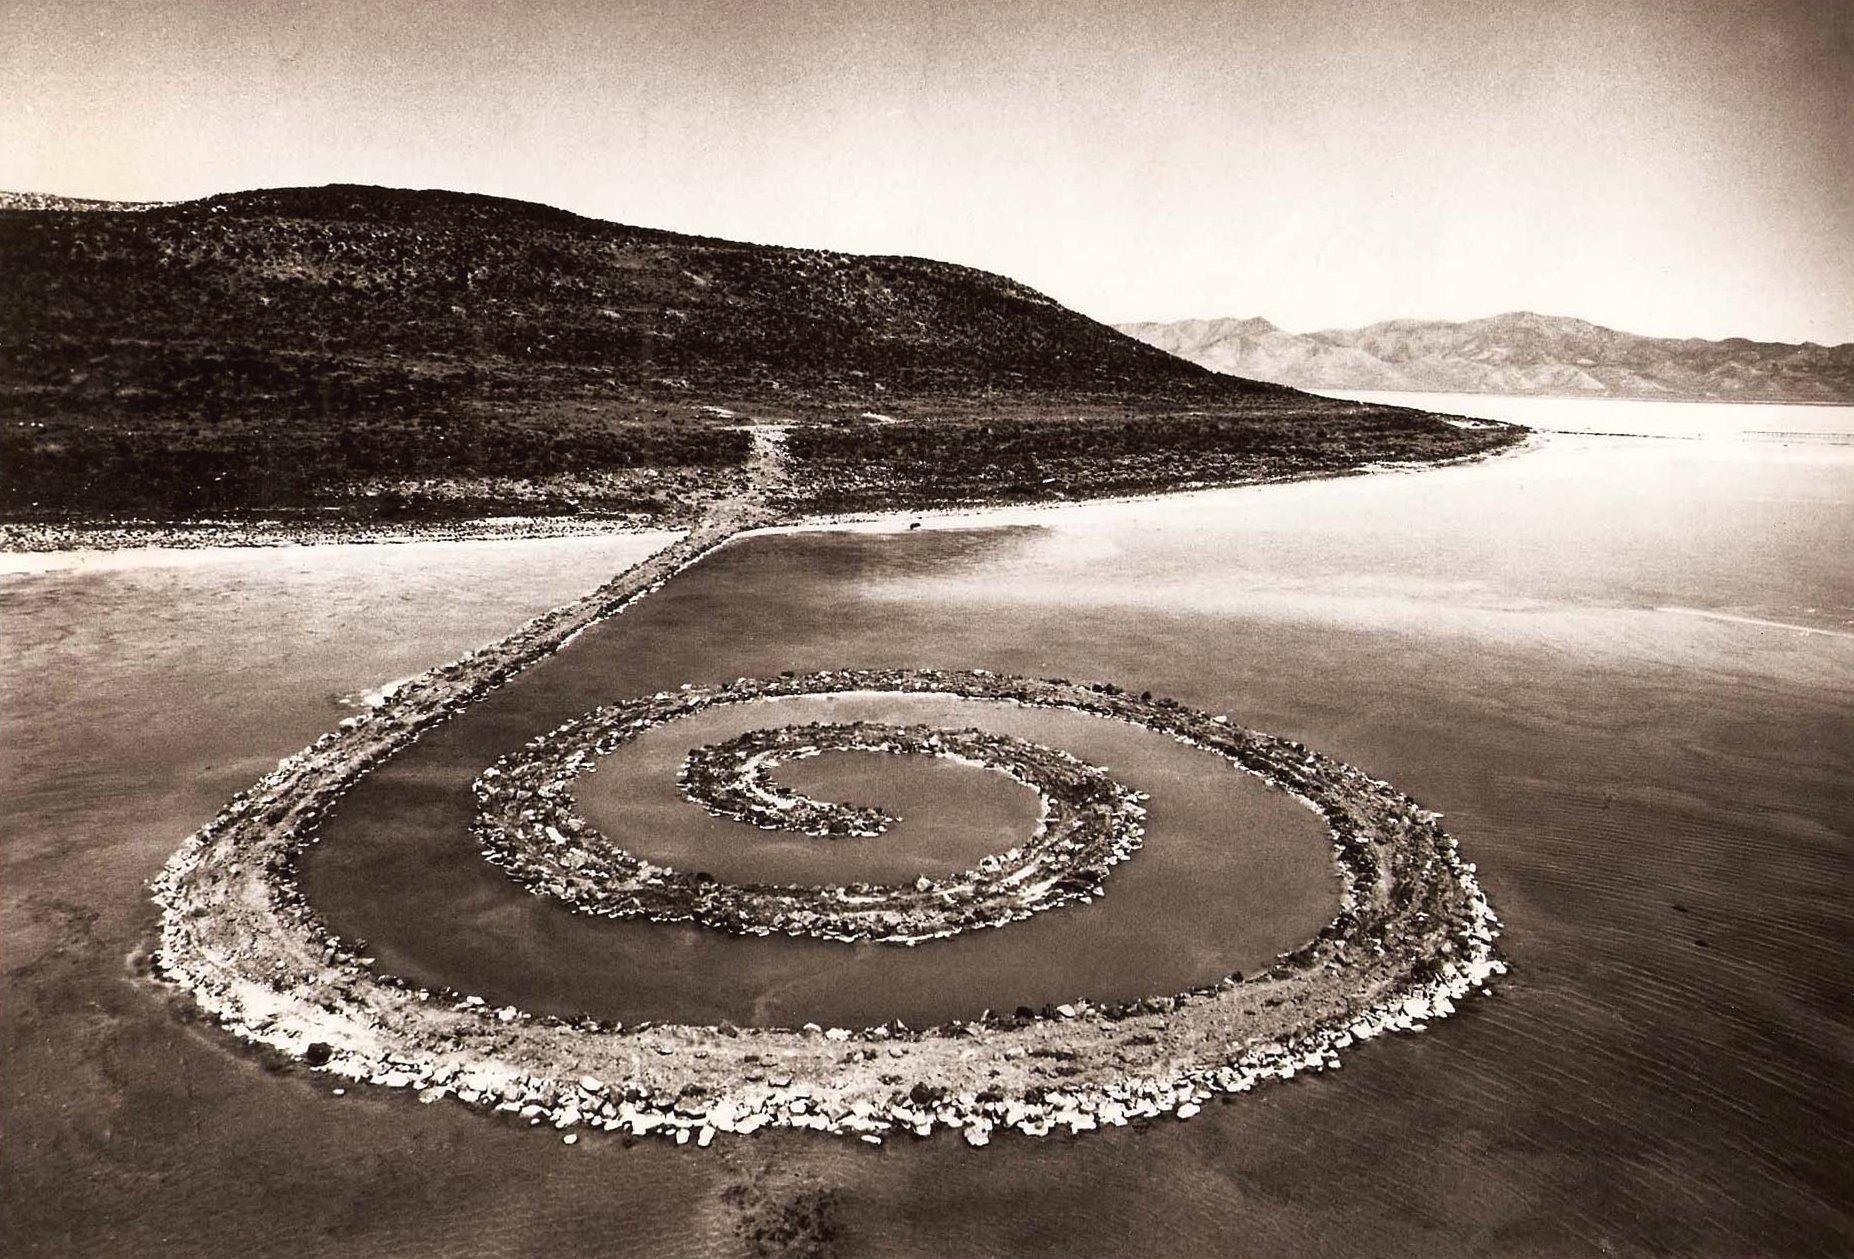 Robert Smithson, Spiral Jetty, 1970 - Gianfranco Gorgoni